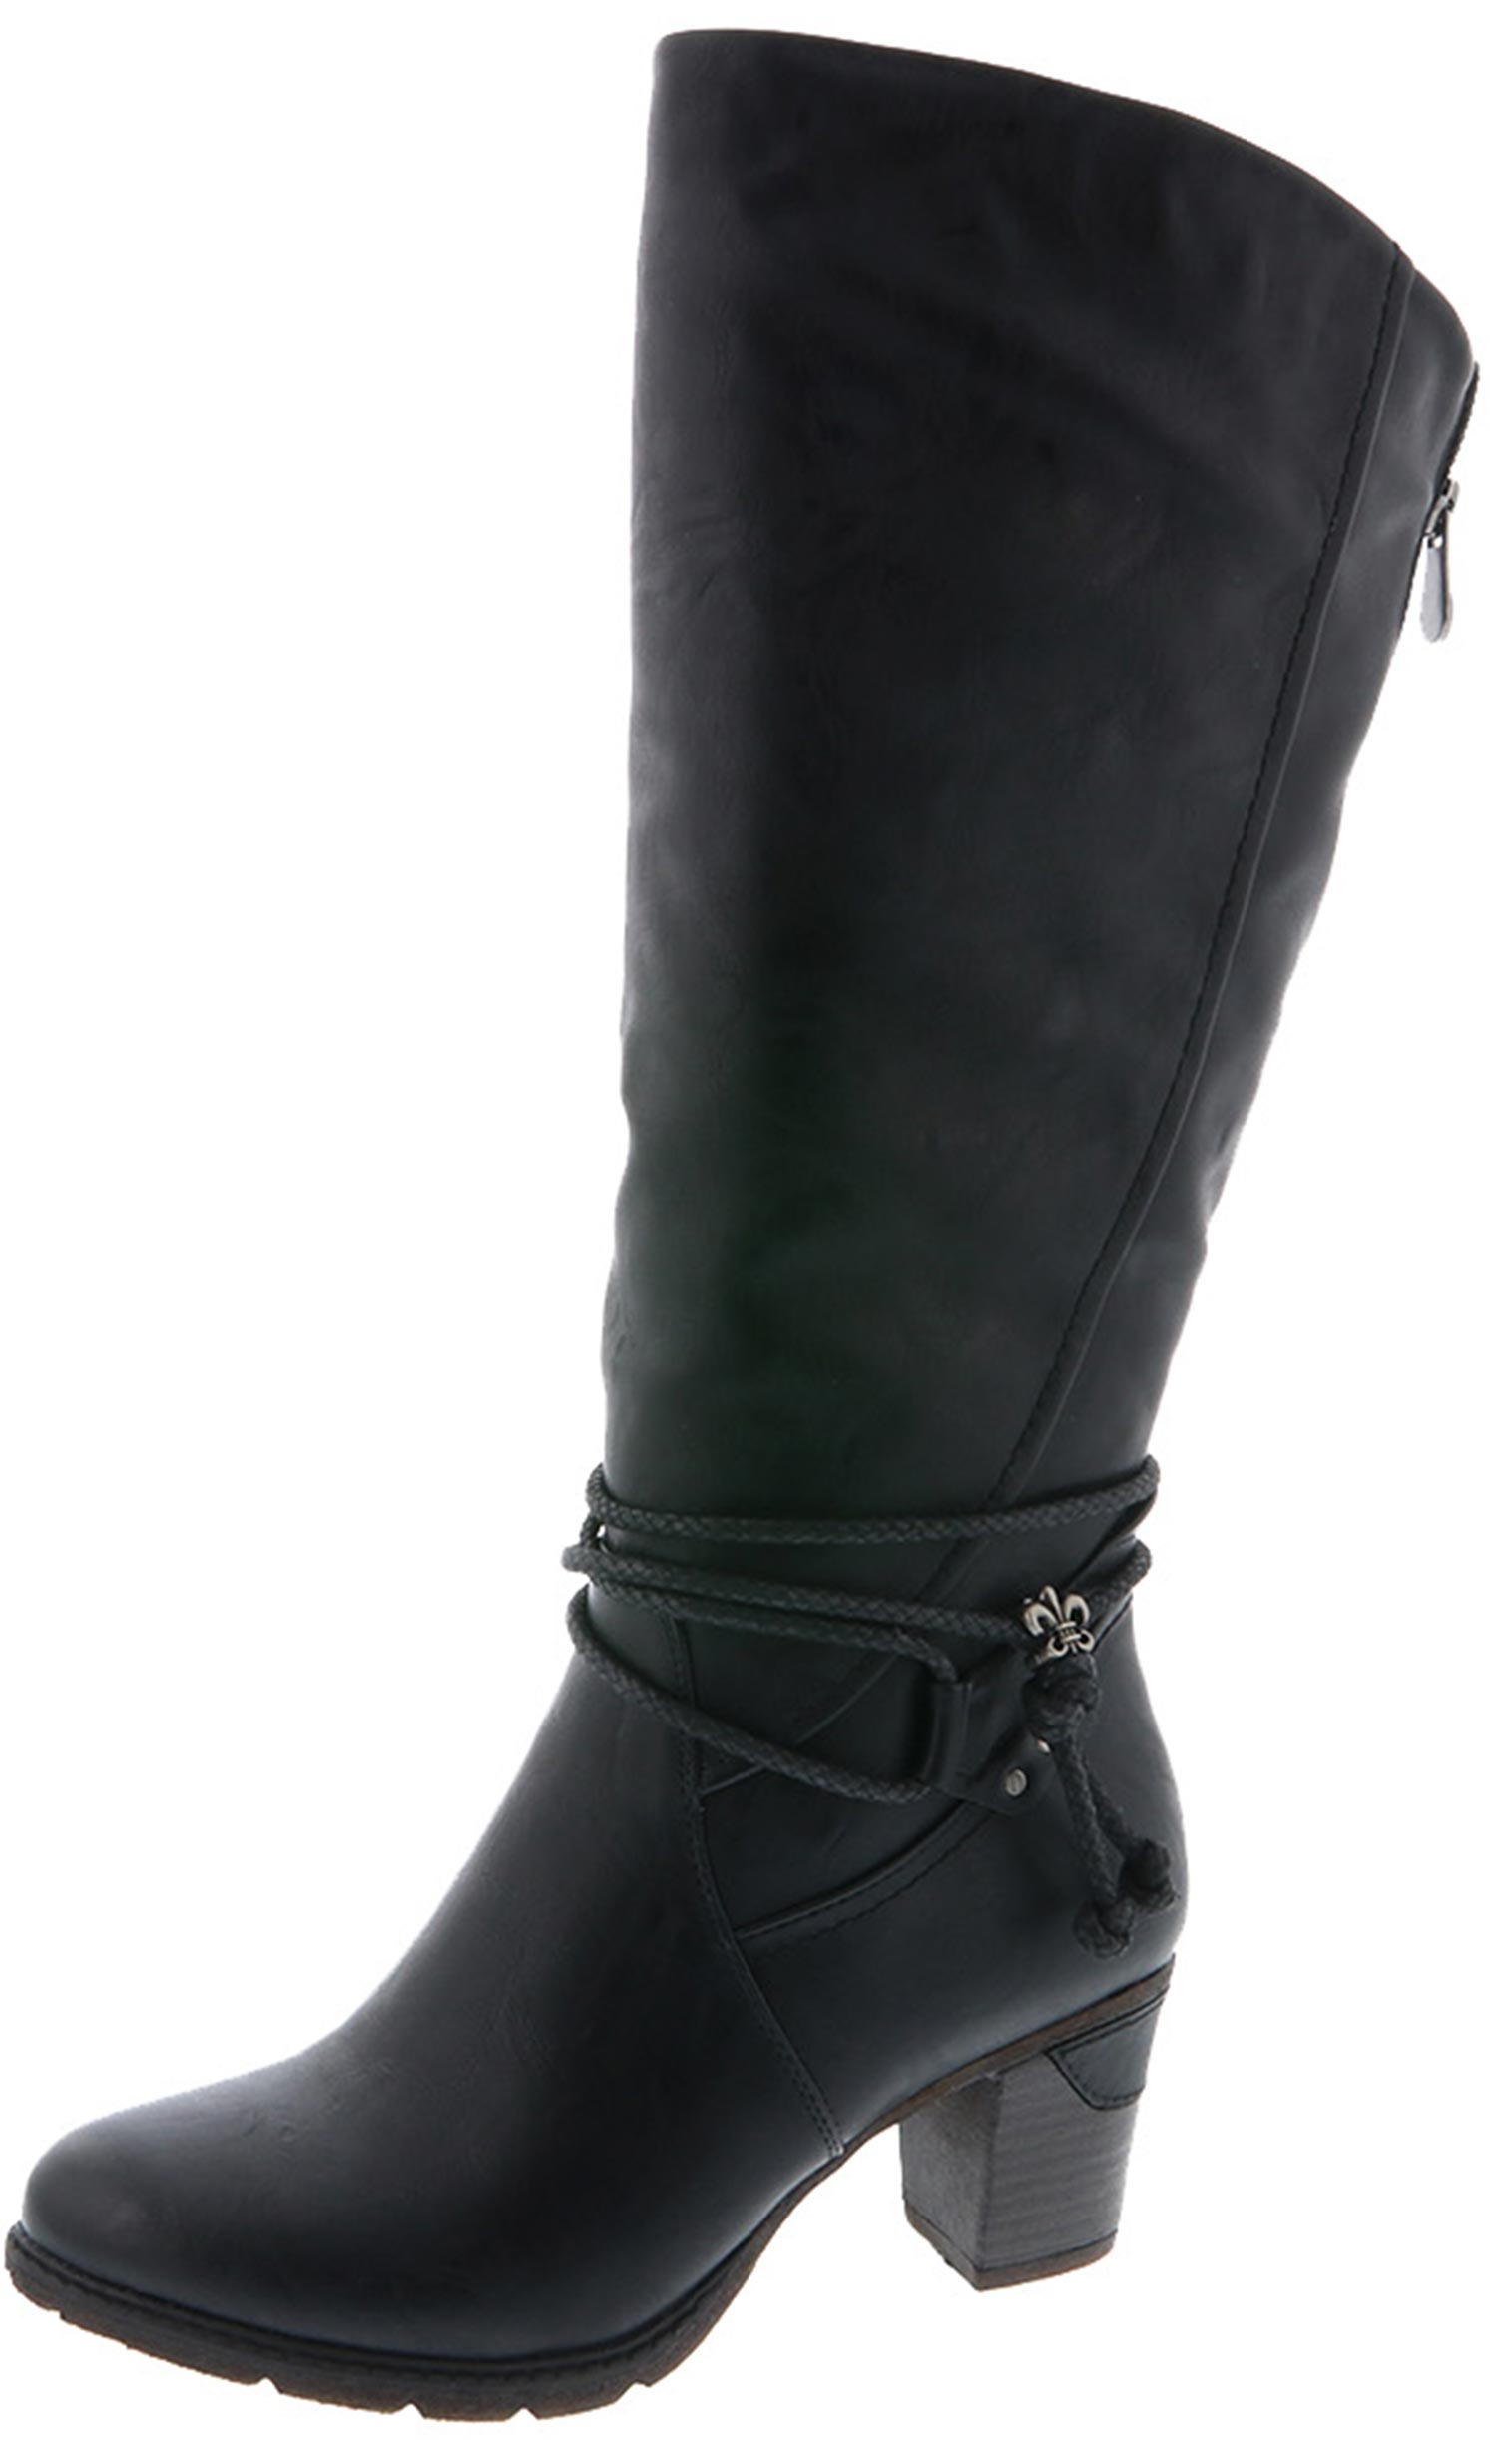 Rieker Damen Stiefel Damenstiefel Boots 96059-00 Schwarz Neu   eBay e342a632a2